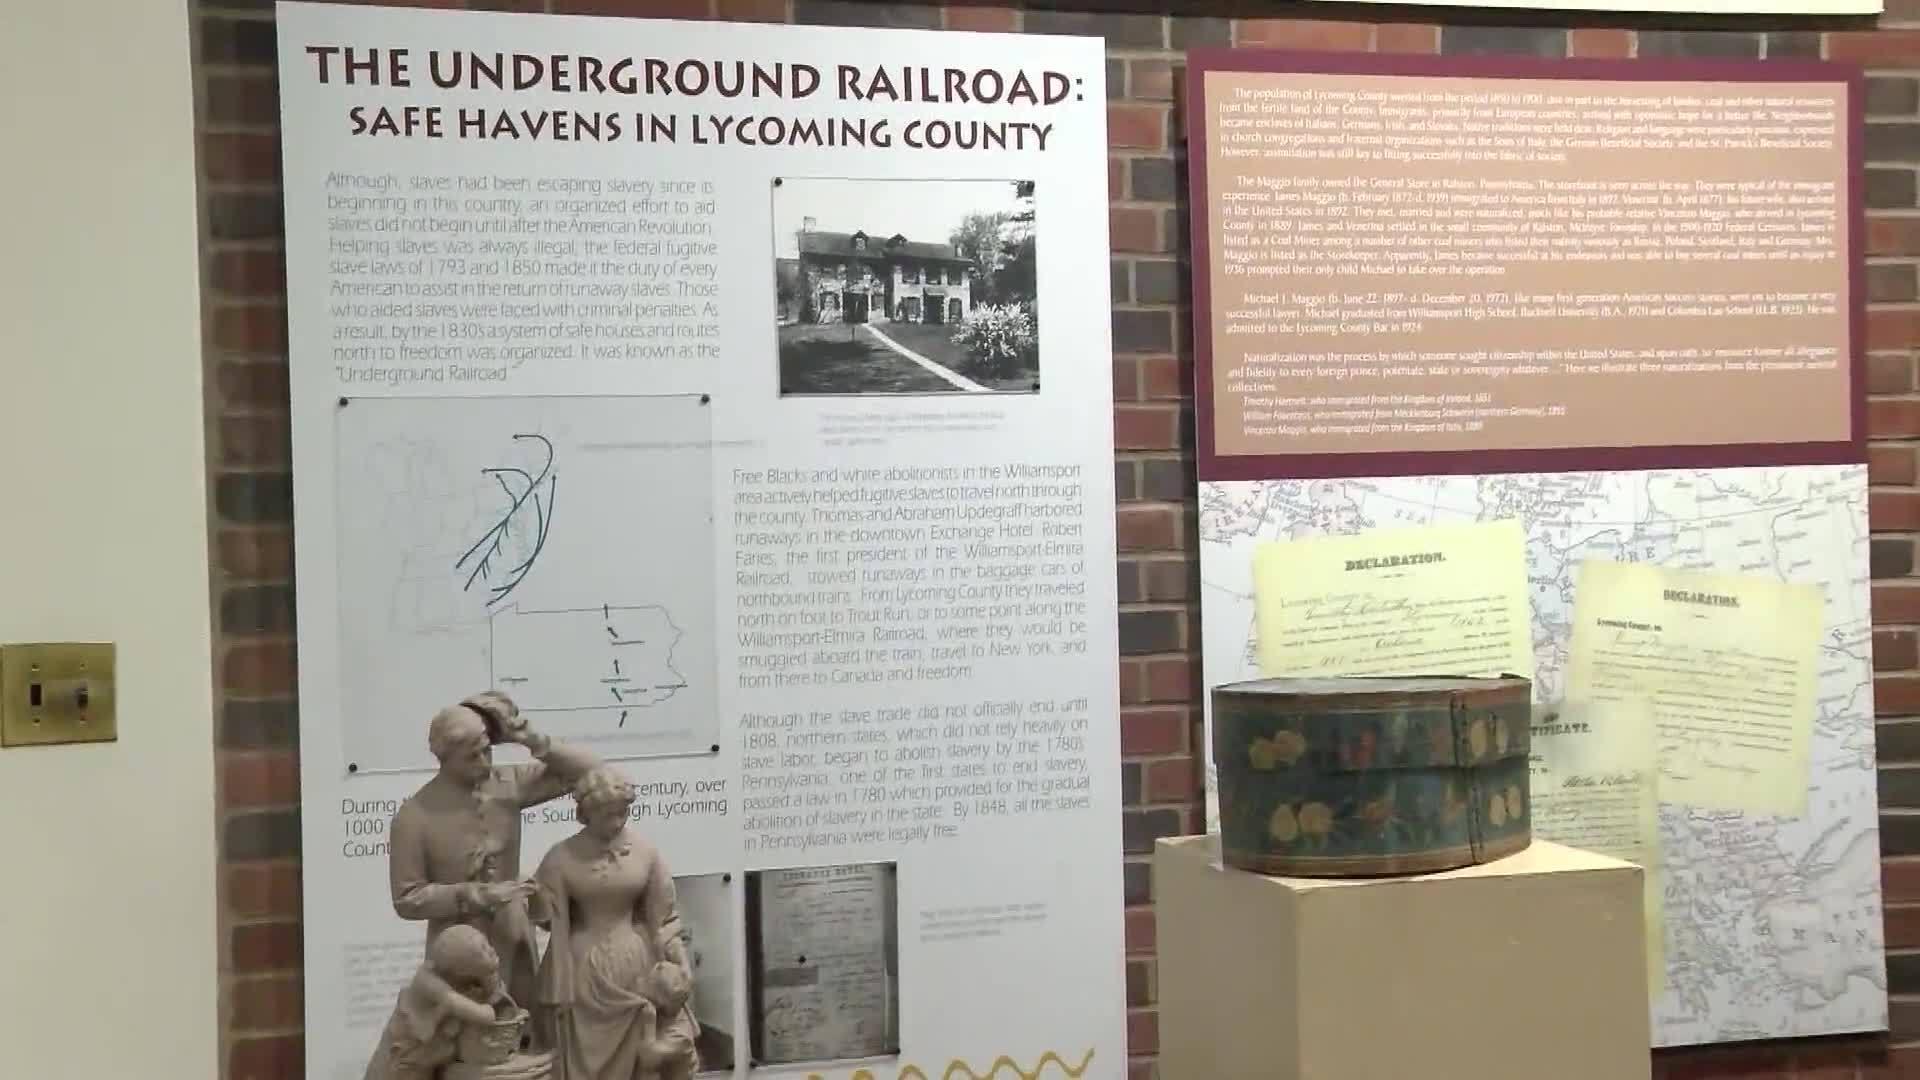 Central_PA_Underground_Railroad_6_20190215190750